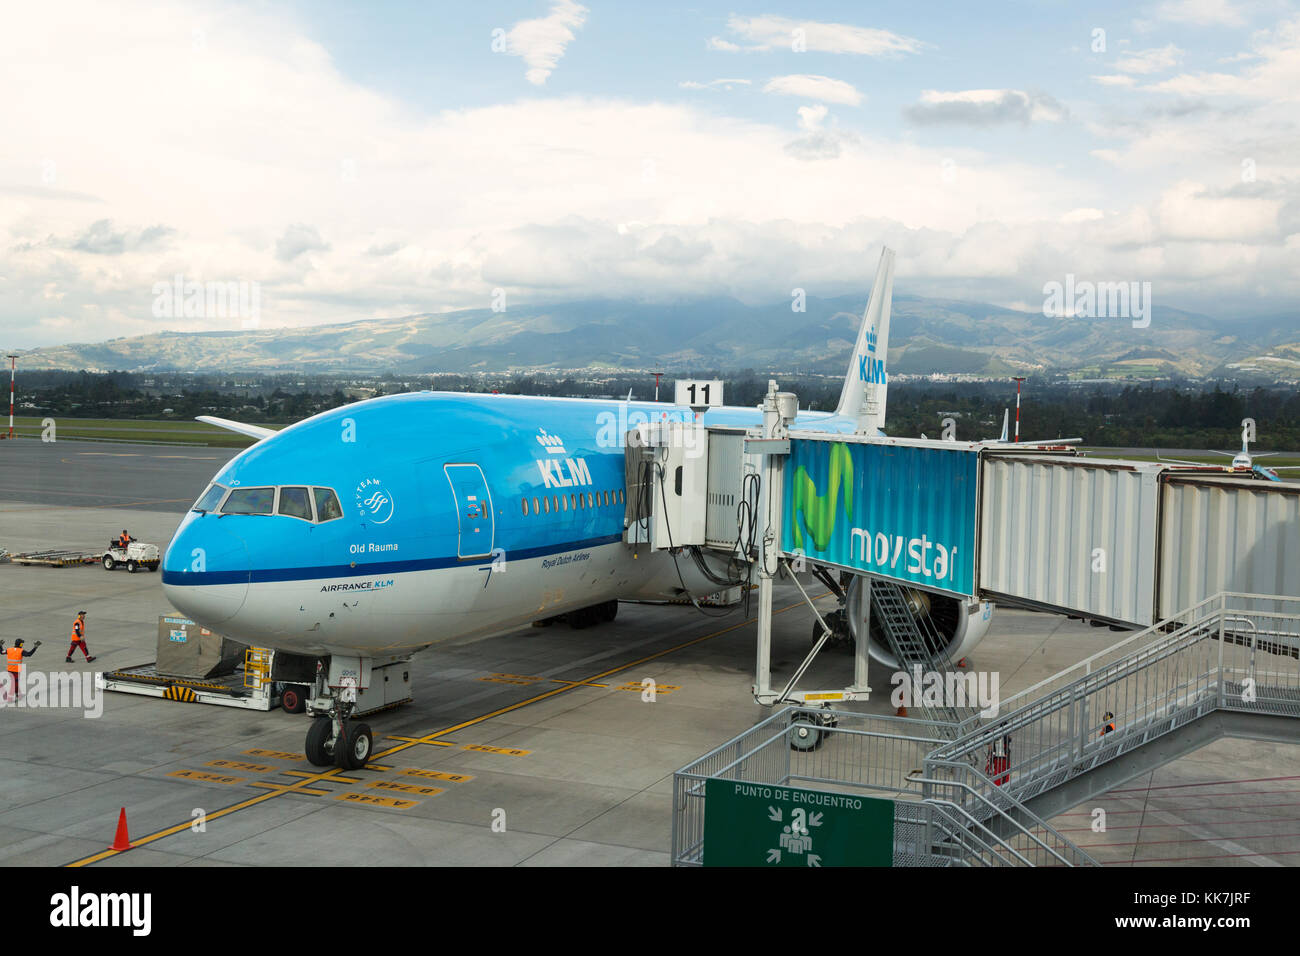 KLM Flugzeug am internationalen Flughafen Mariscal Sucre in Quito, Ecuador, Südamerika Stockbild